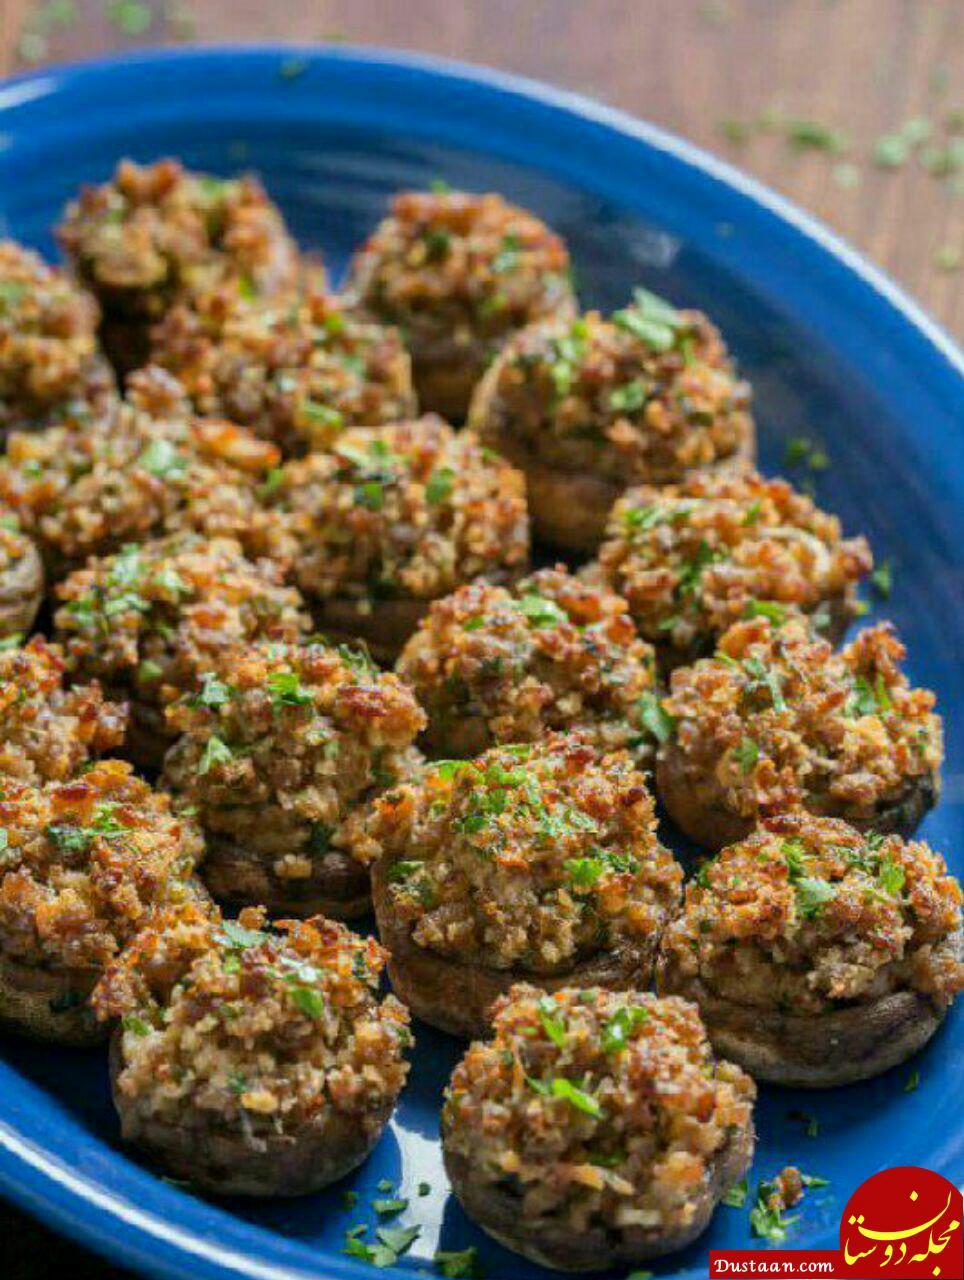 www.dustaan.com طرز تهیه قارچ شکم پر در فر به سبکی خوشمزه و متفاوت